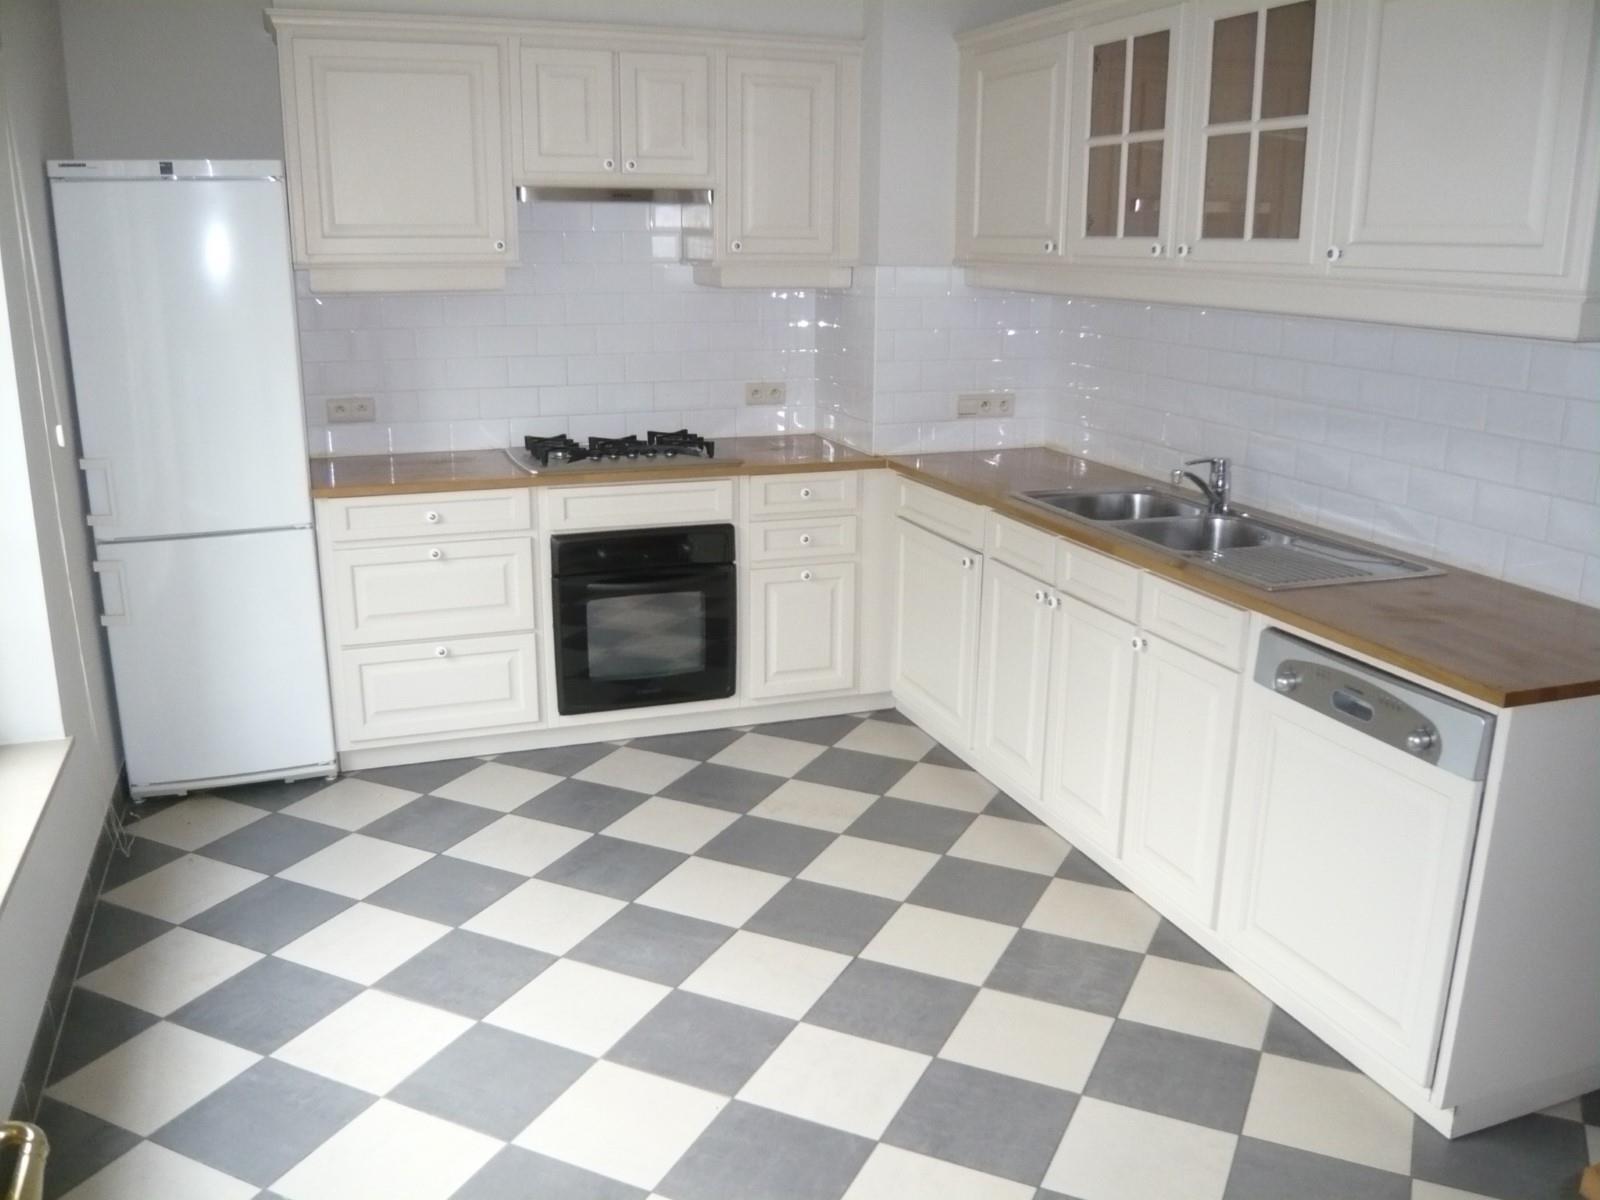 Appartement exceptionnel - Woluwe-Saint-Pierre - #2927607-3